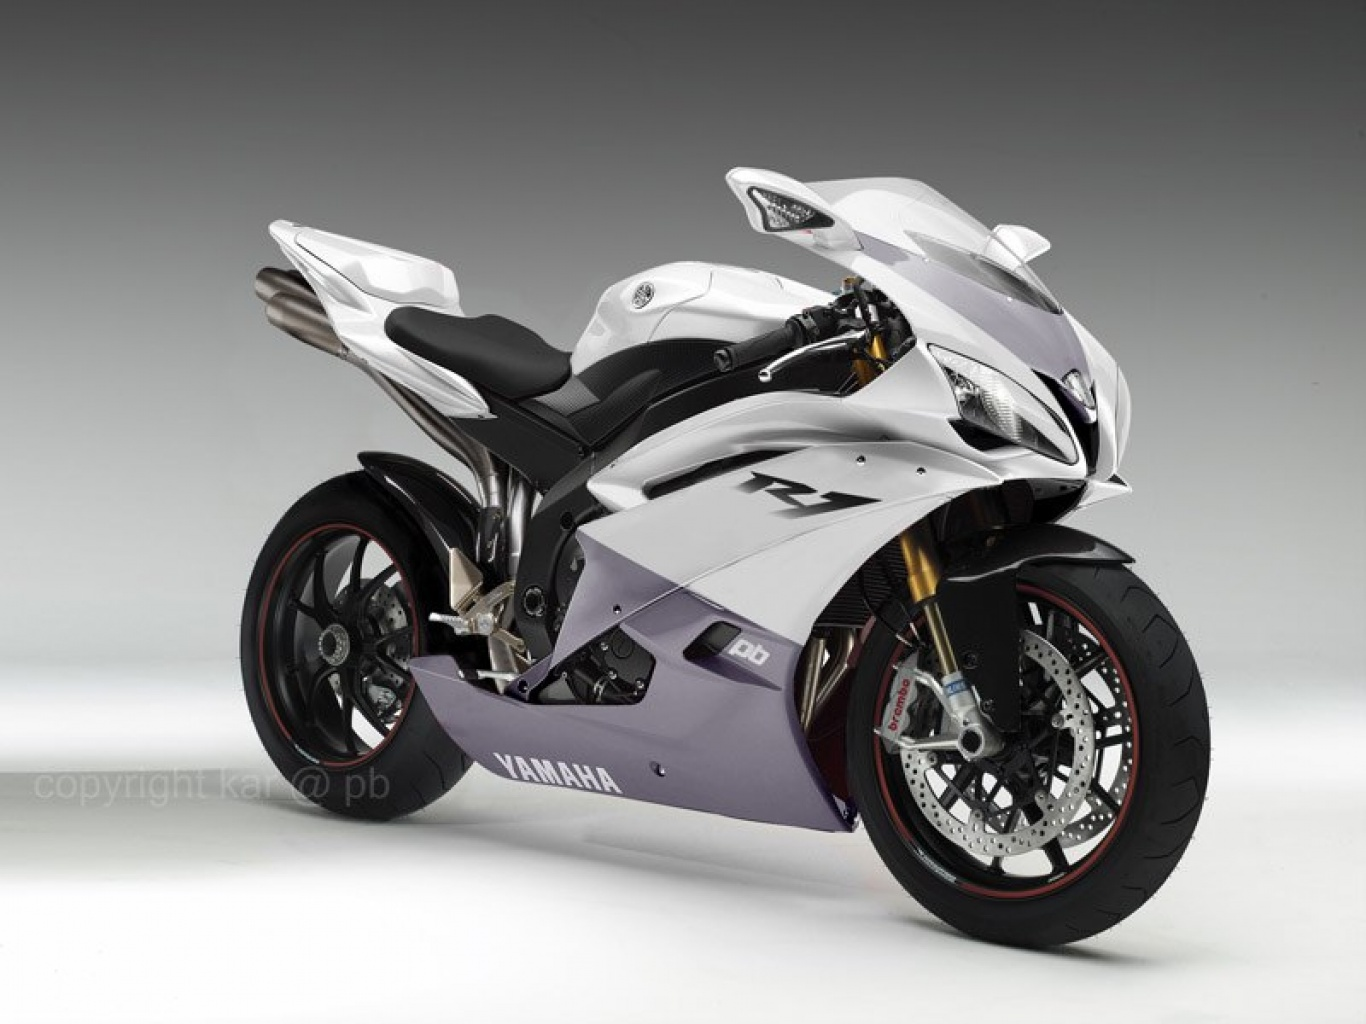 MIL ANUNCIOS.COM - kawasaki Kz. Compra-venta de motos